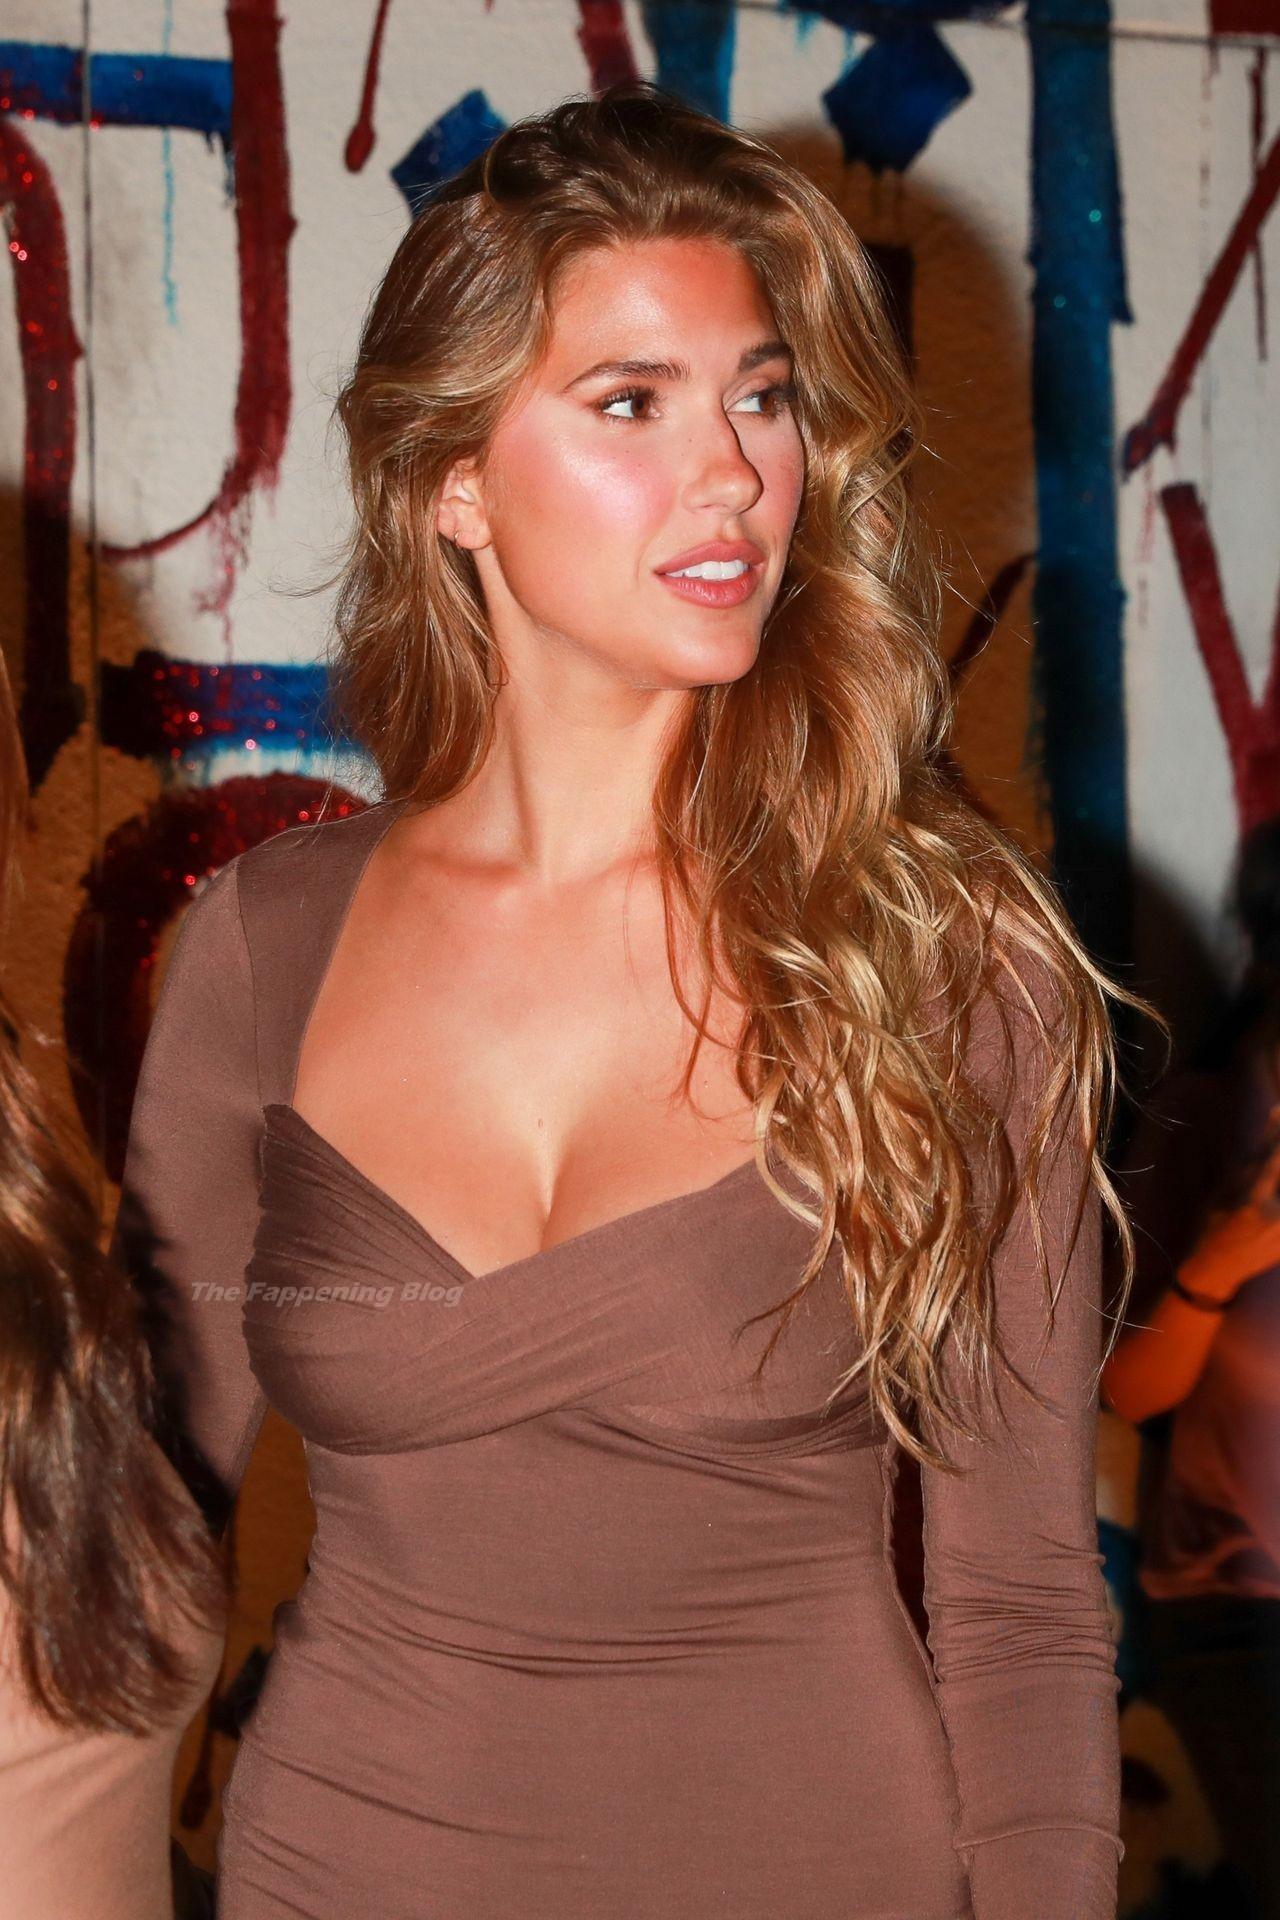 Kara-Del-Toro-Sexy-The-Fappening-Blog-1-1.jpg